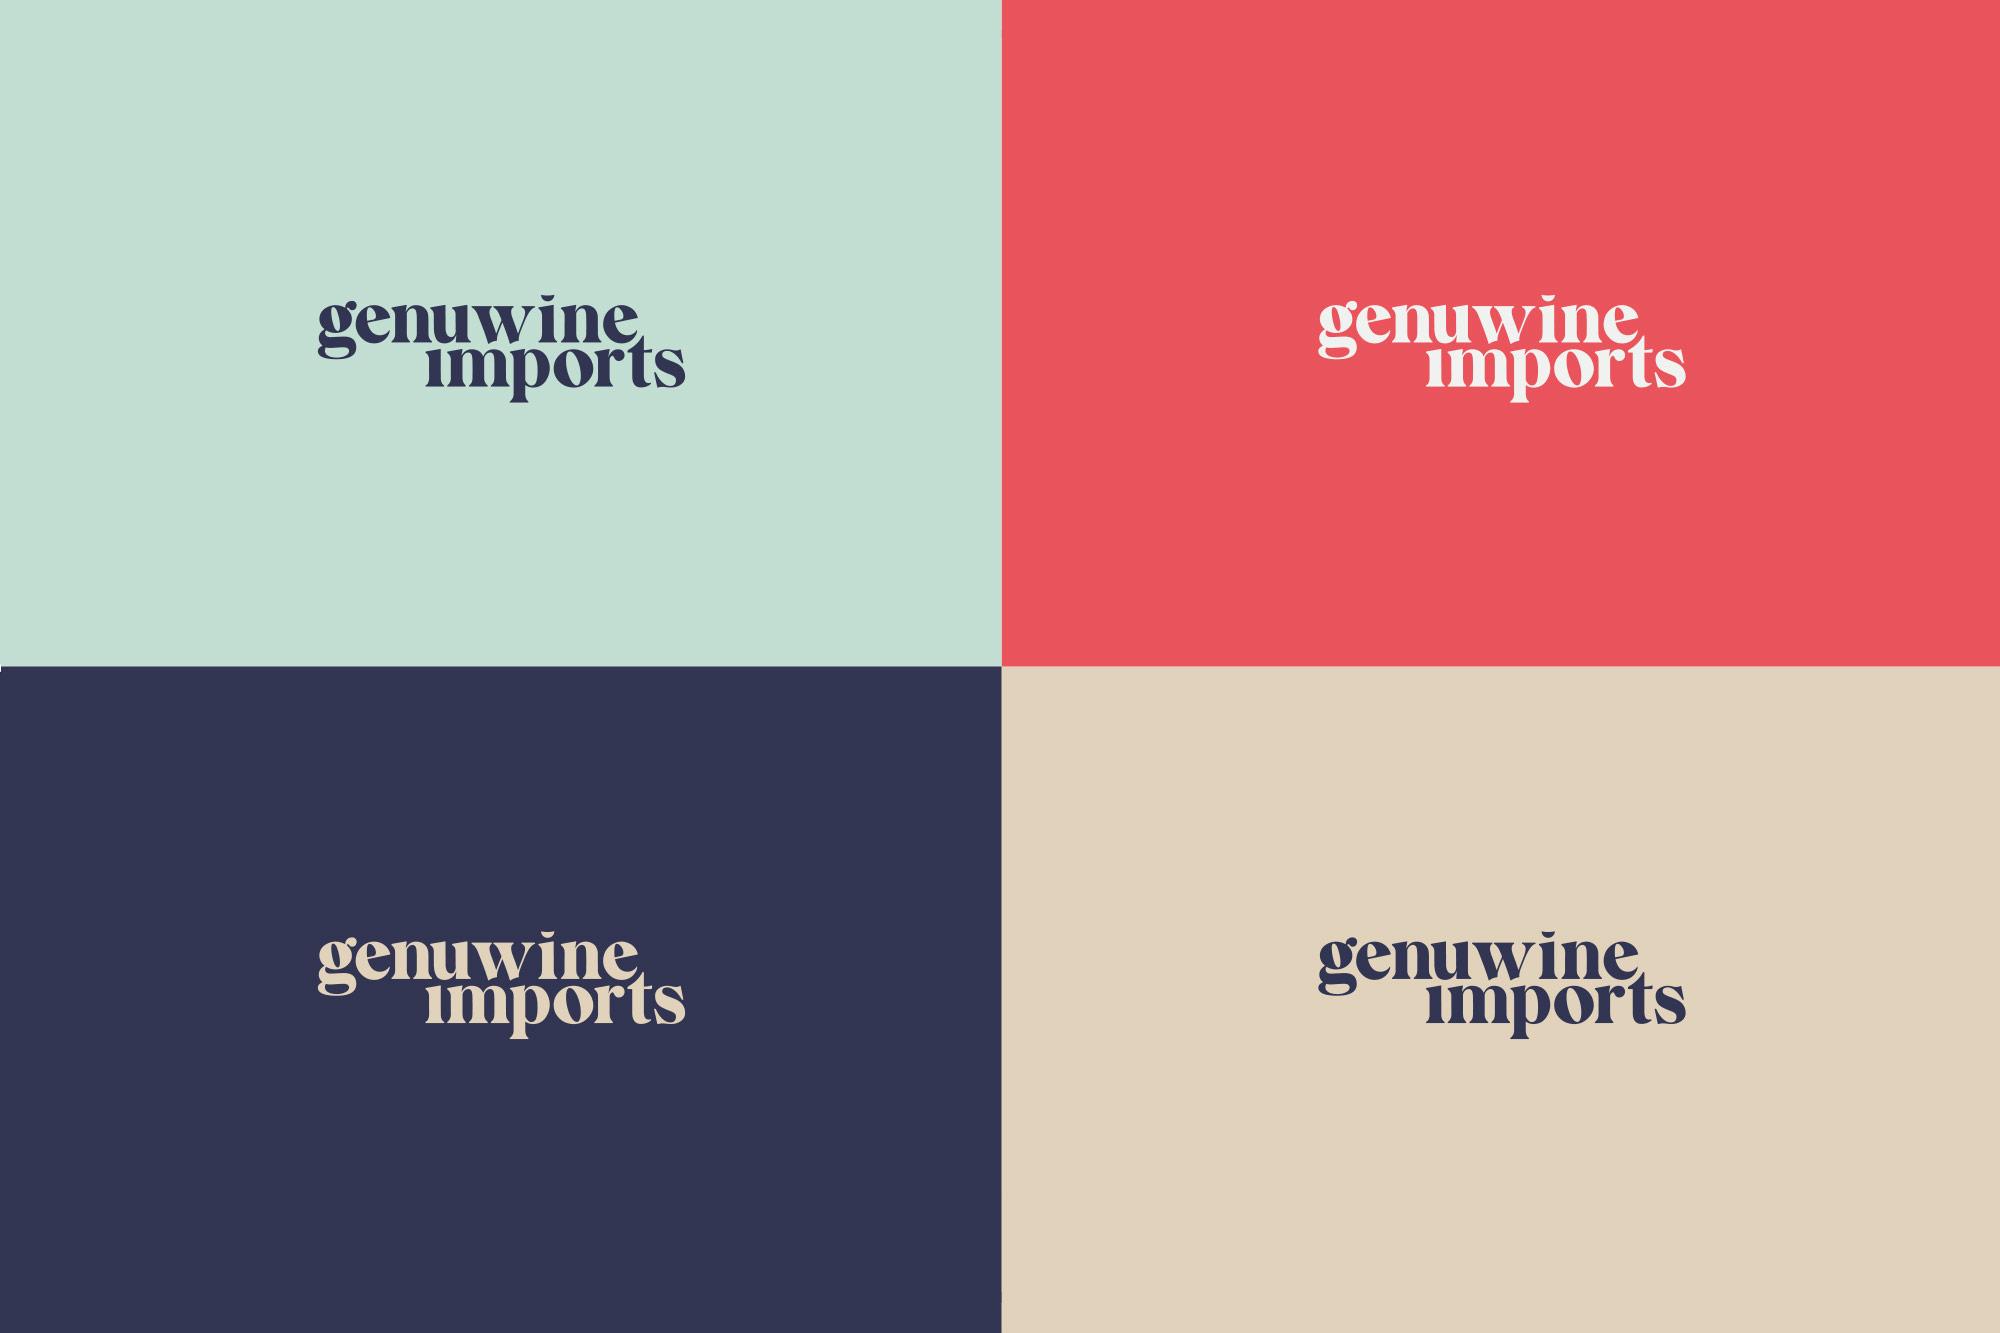 gpj-studio-genuwine-brand-identity-cs-04